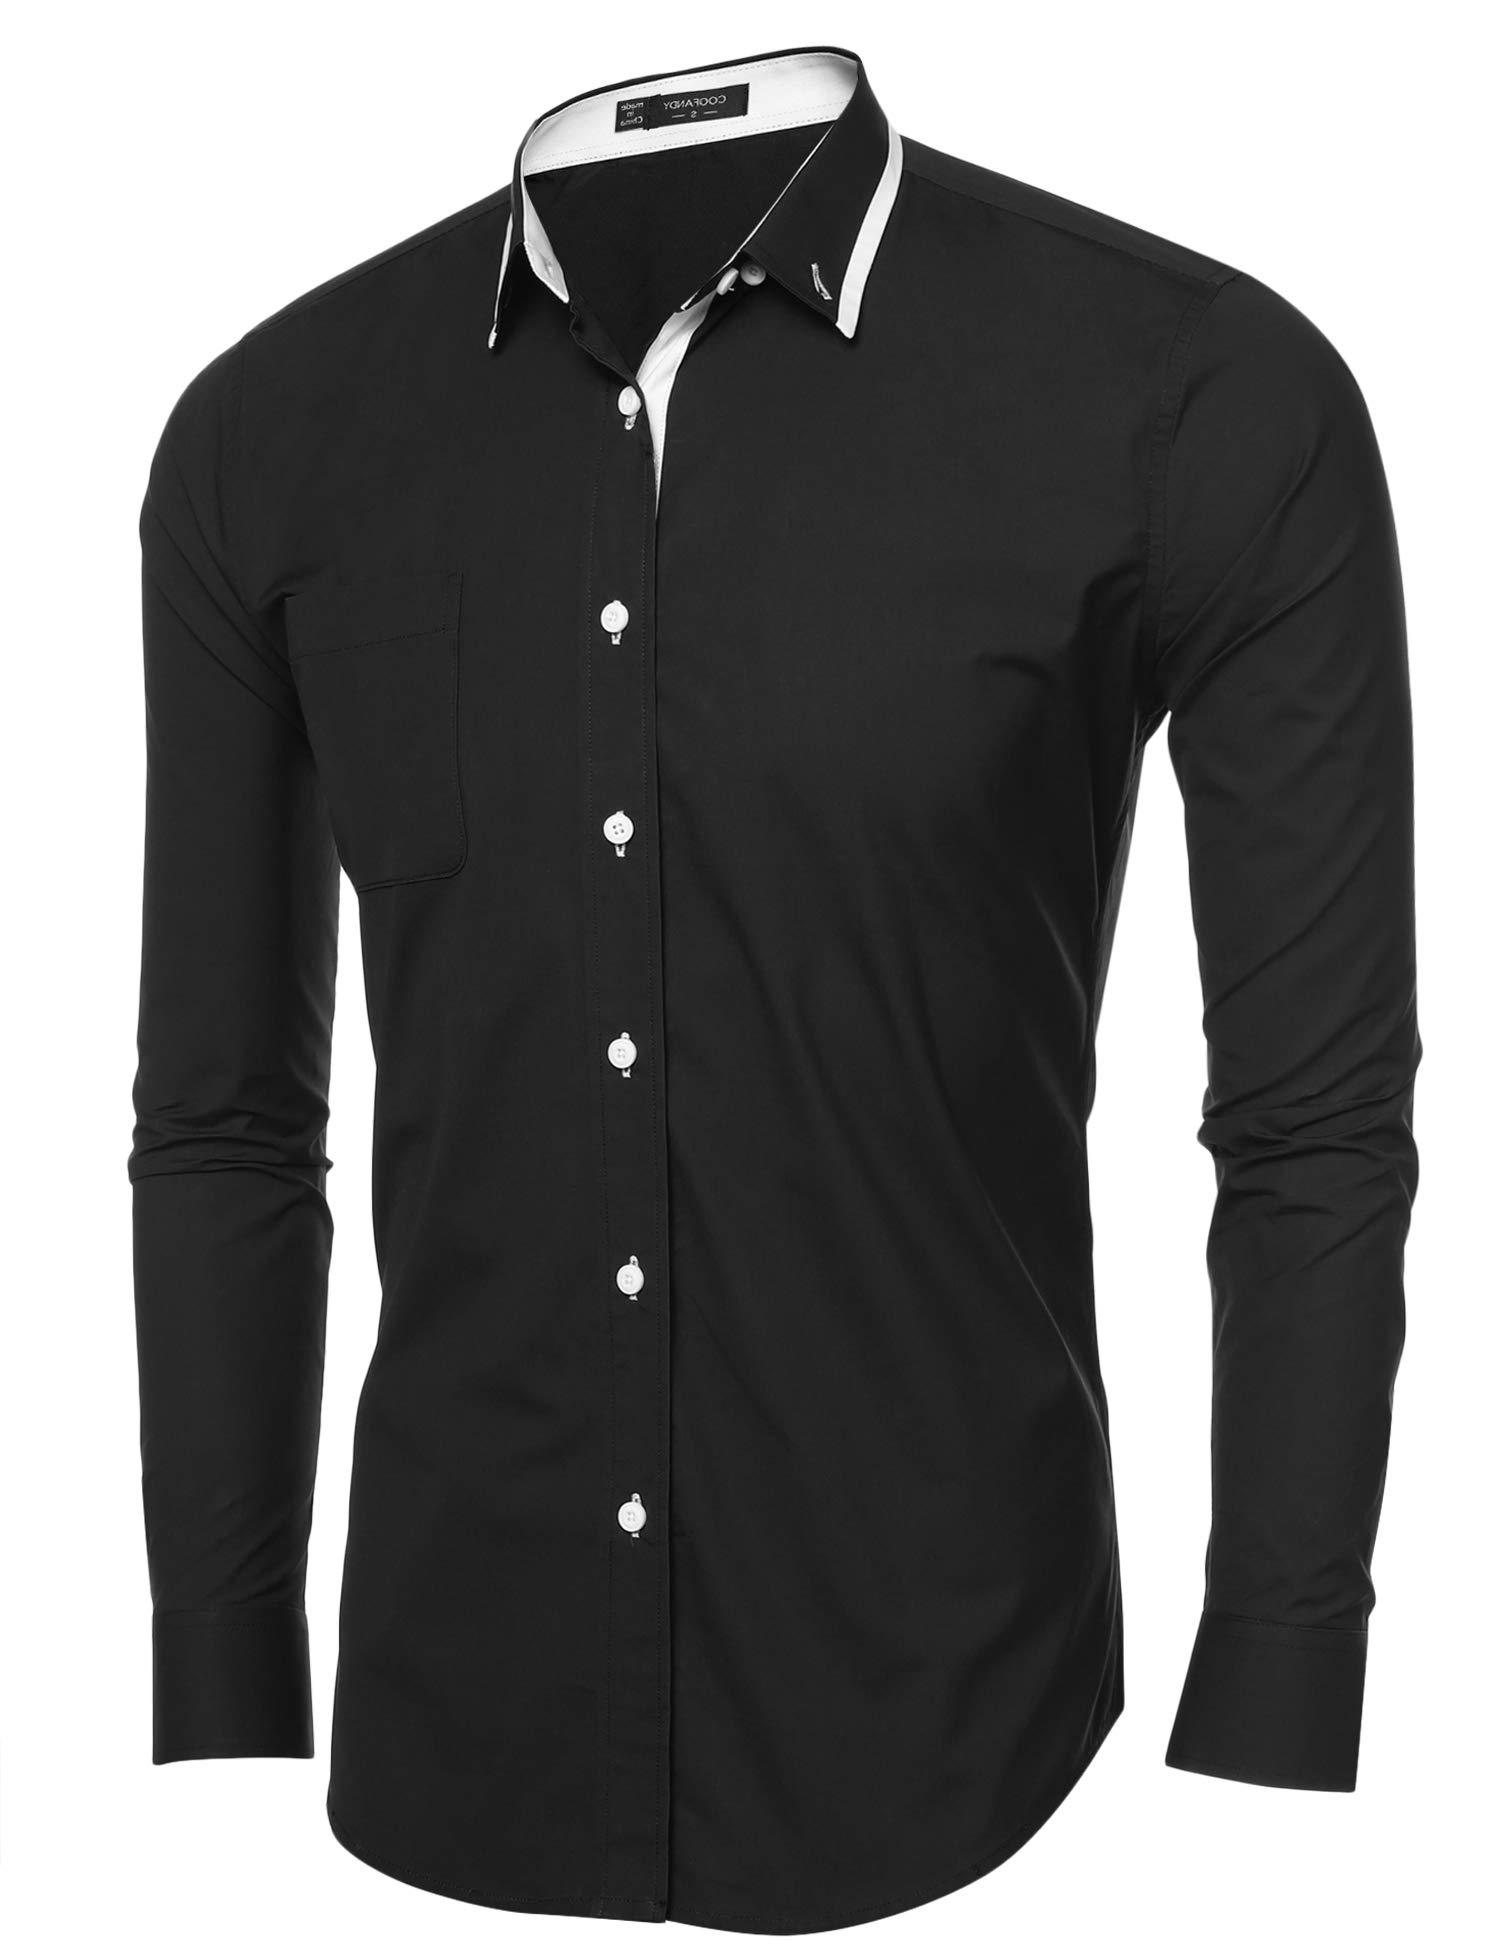 COOFANDY Mens Casual Slim Fit Long Sleeve Shirt Dress Shirts(Black,Medium)